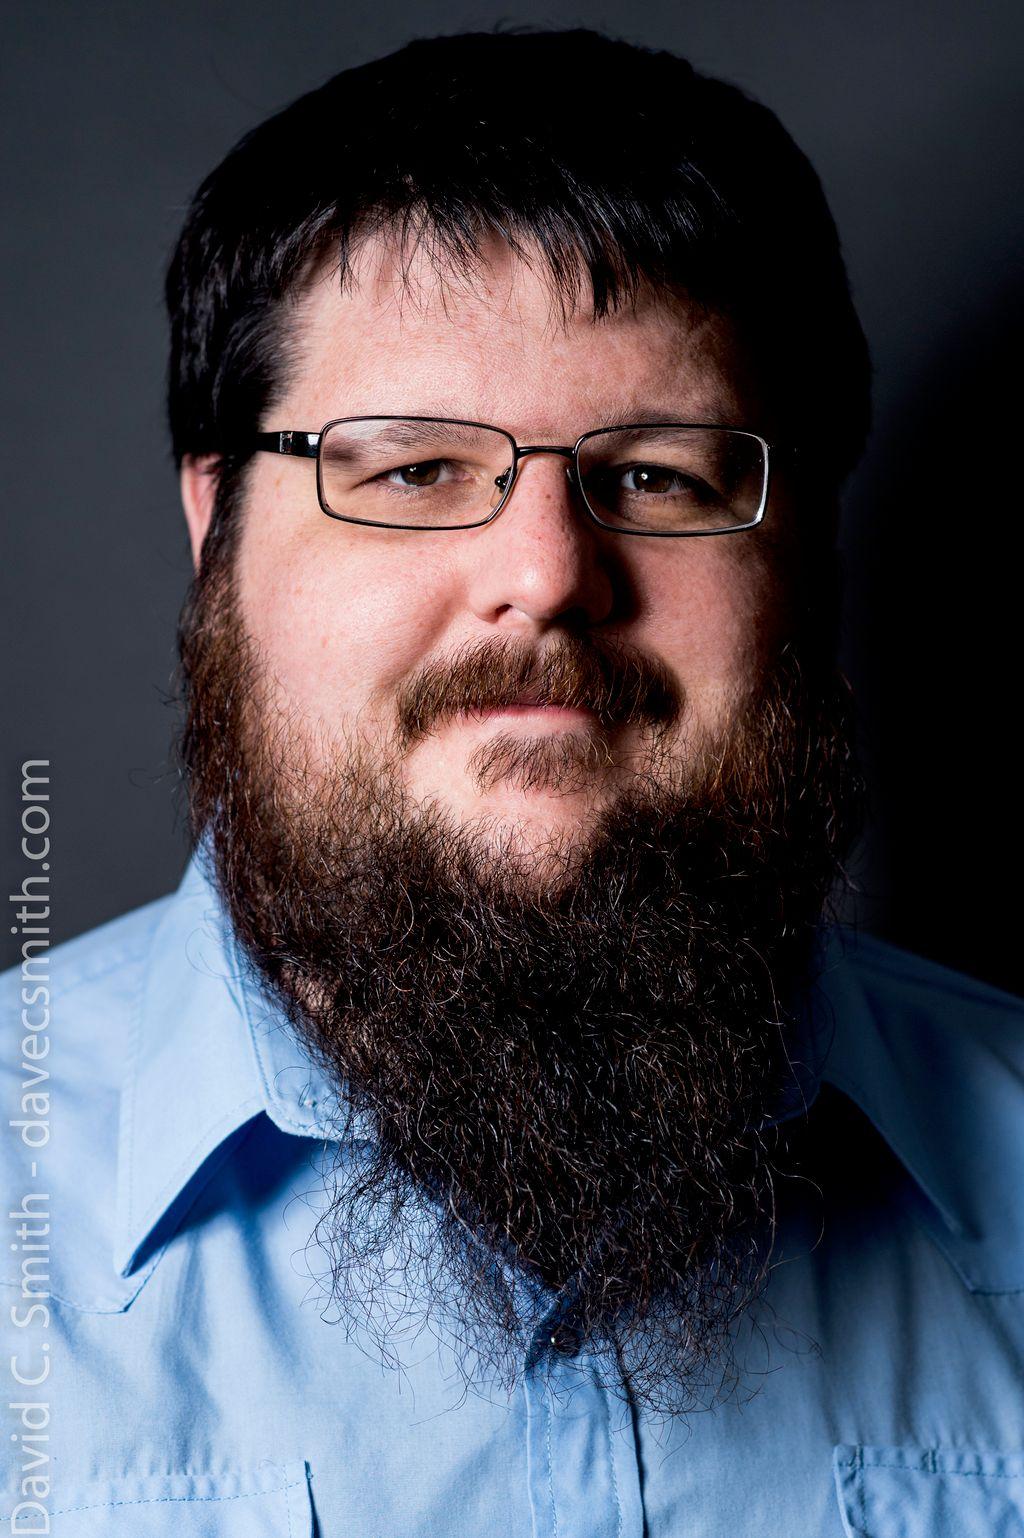 Dave C. Smith Photography